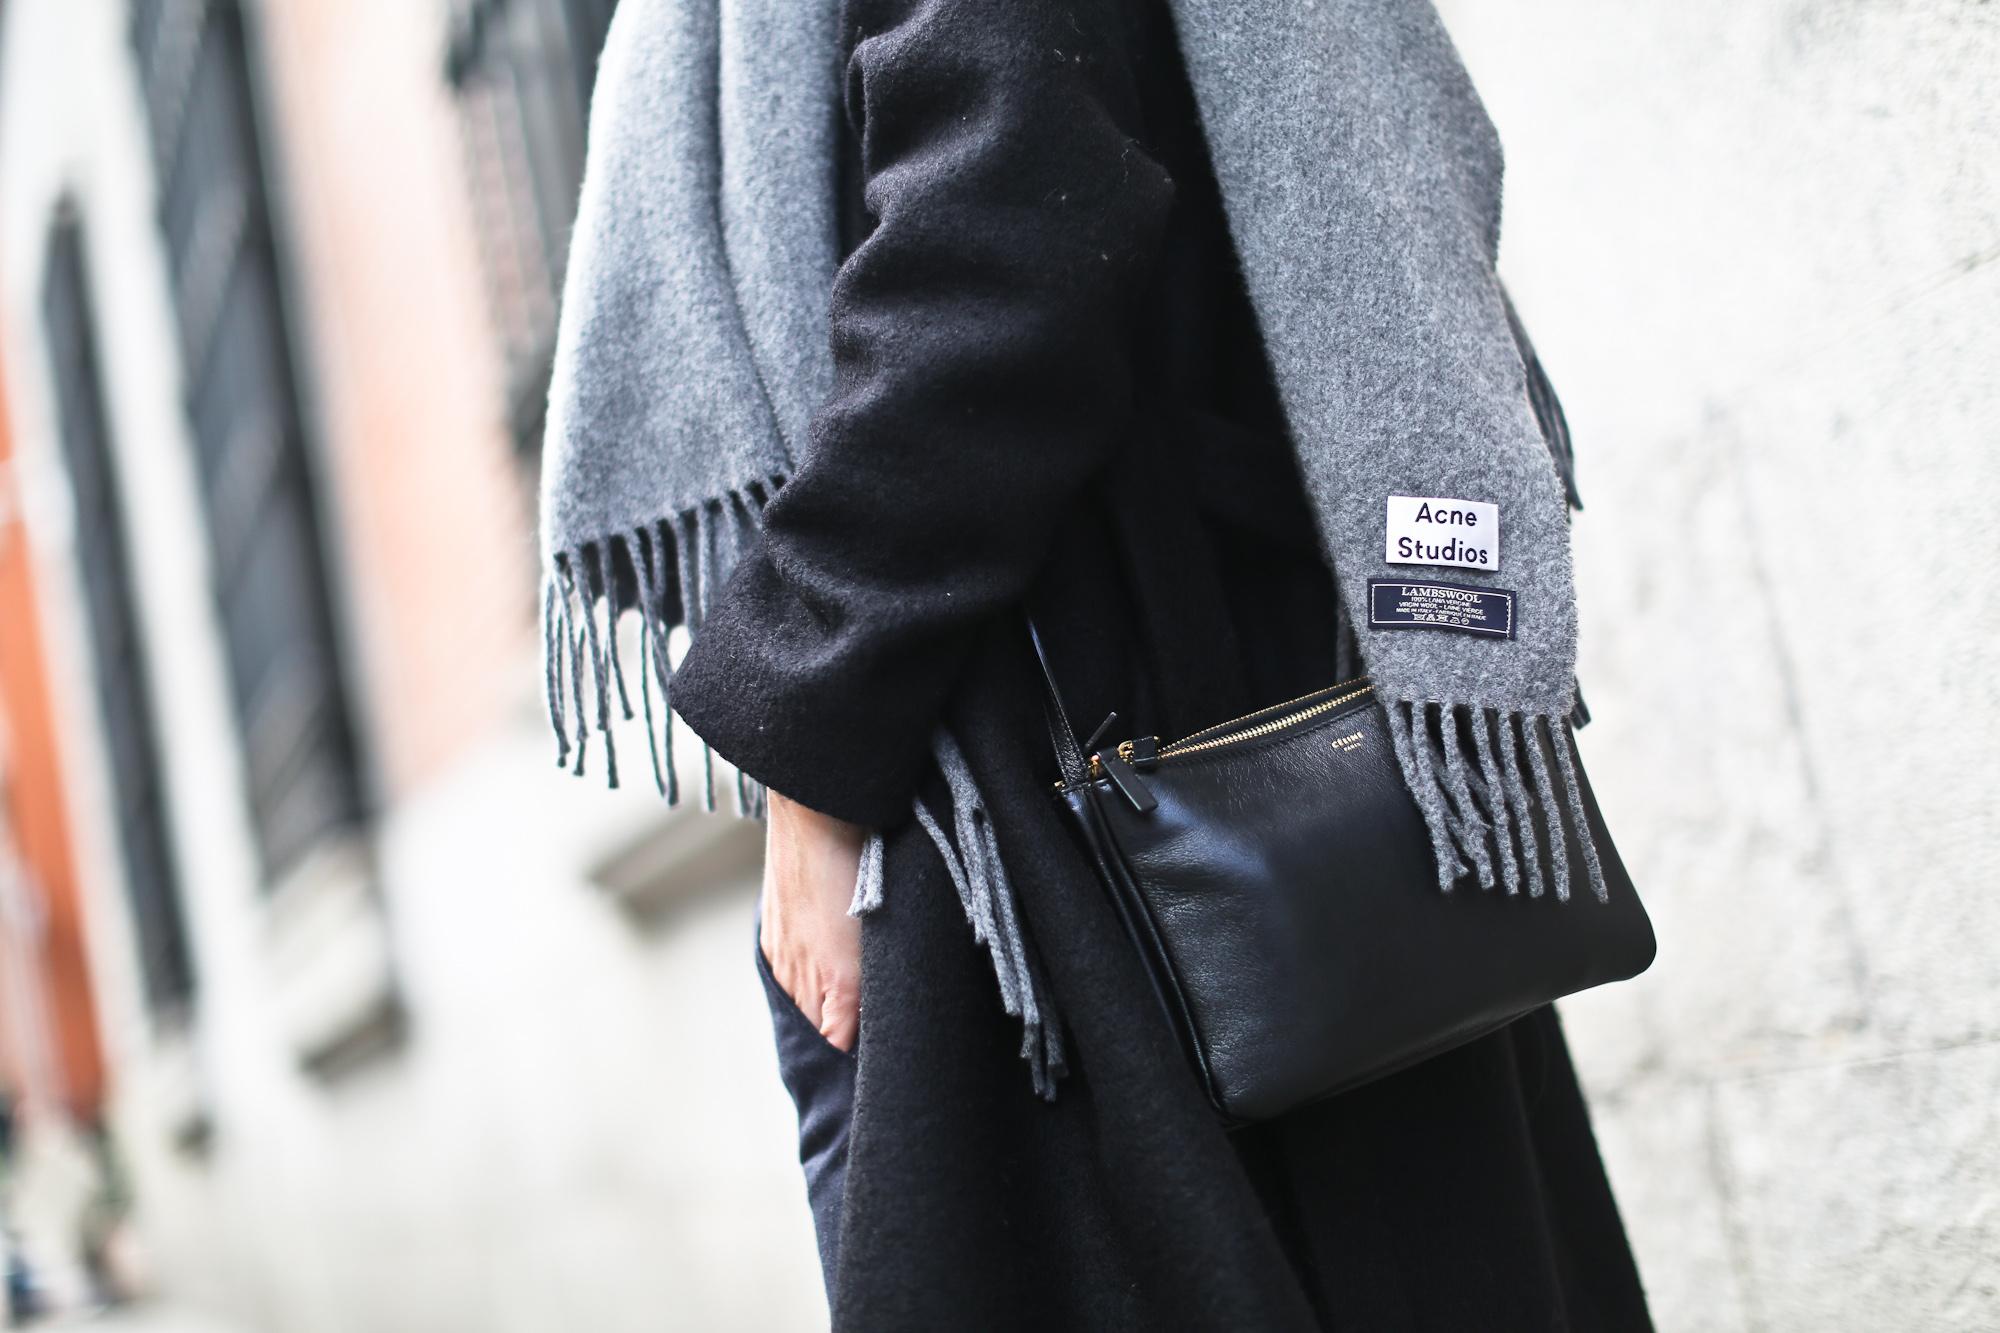 Clochet_streetstyle_cos_wool_long_coat_maje_panta_adidas_samba-12